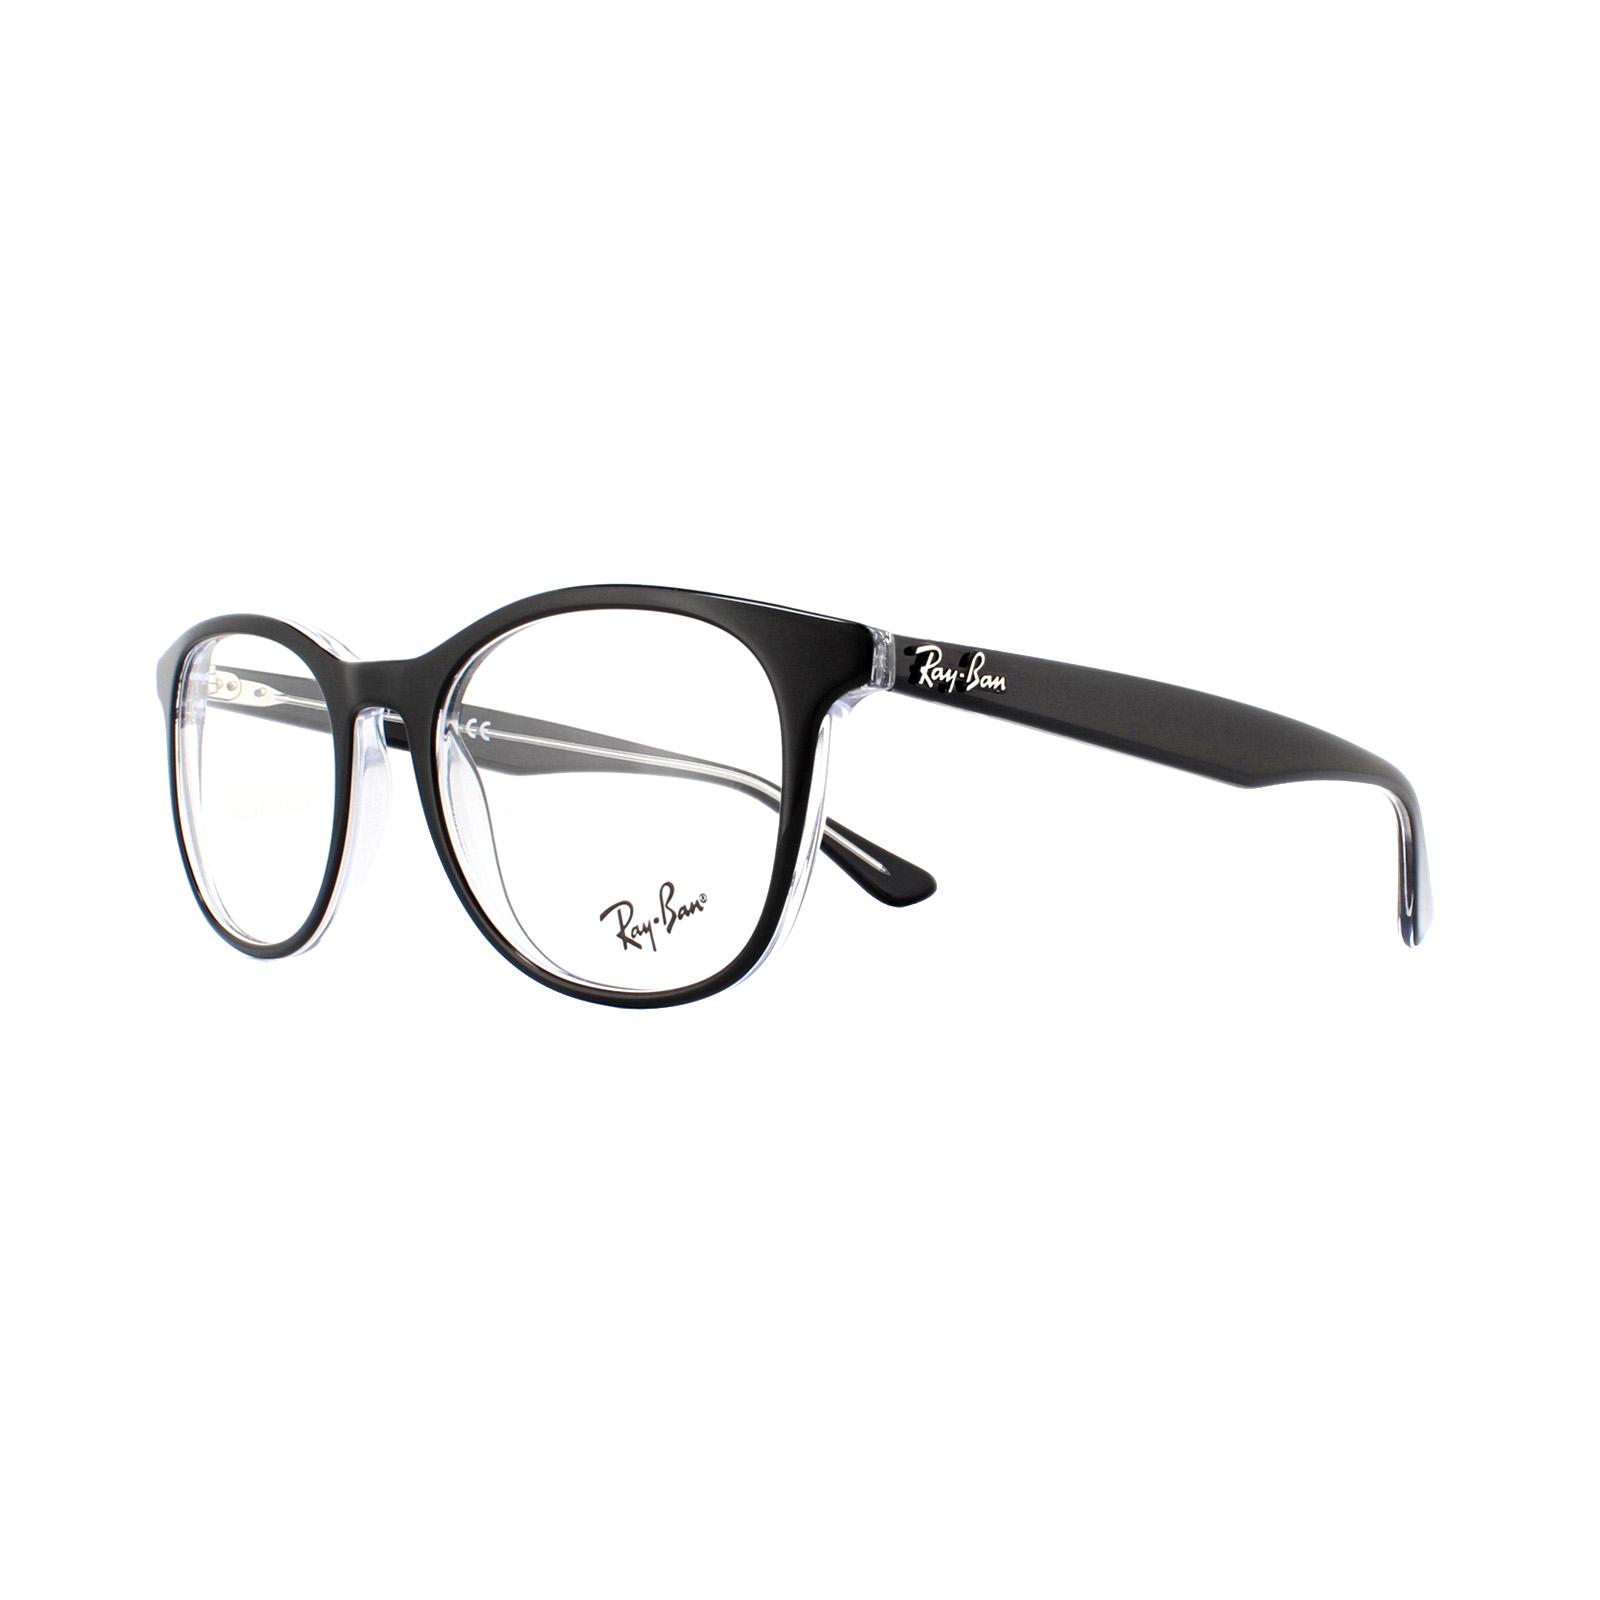 0f8020c290 Sentinel Ray-Ban Glasses Frames 5356 2034 Top Black On Transparrent 52mm